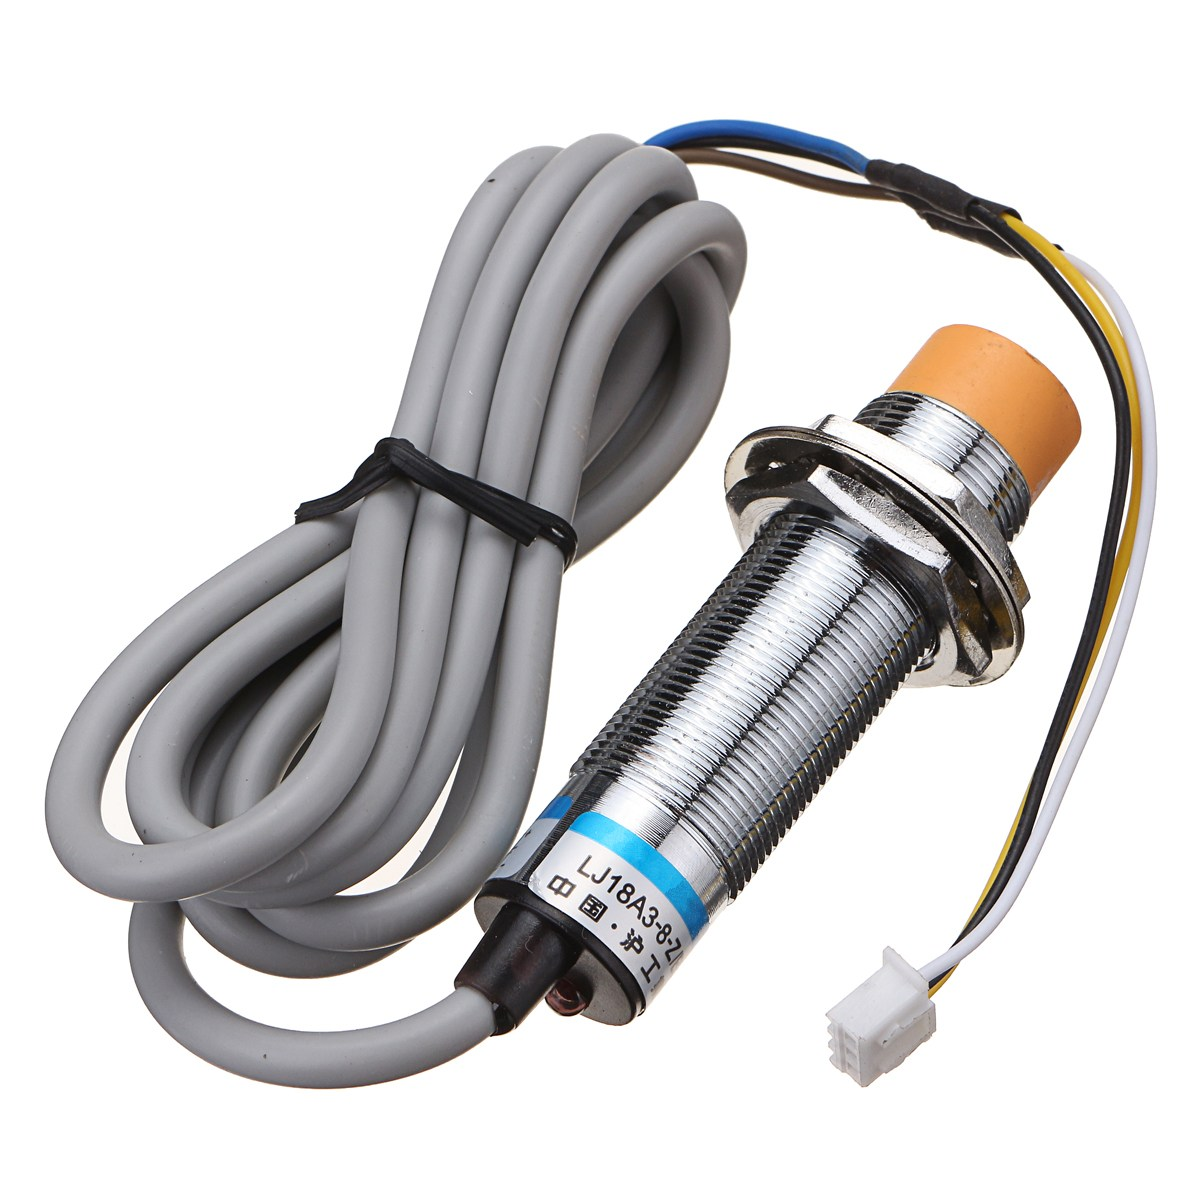 New Arrival 1PC LJ18A3-8-Z/BX Type Autolevel Inductive Sensor For Anet A8 A2 A6 3D Printer m18 no npn 8mm approach sensor inductive proximity switch 5vdc lj18a3 8 z bx 5v